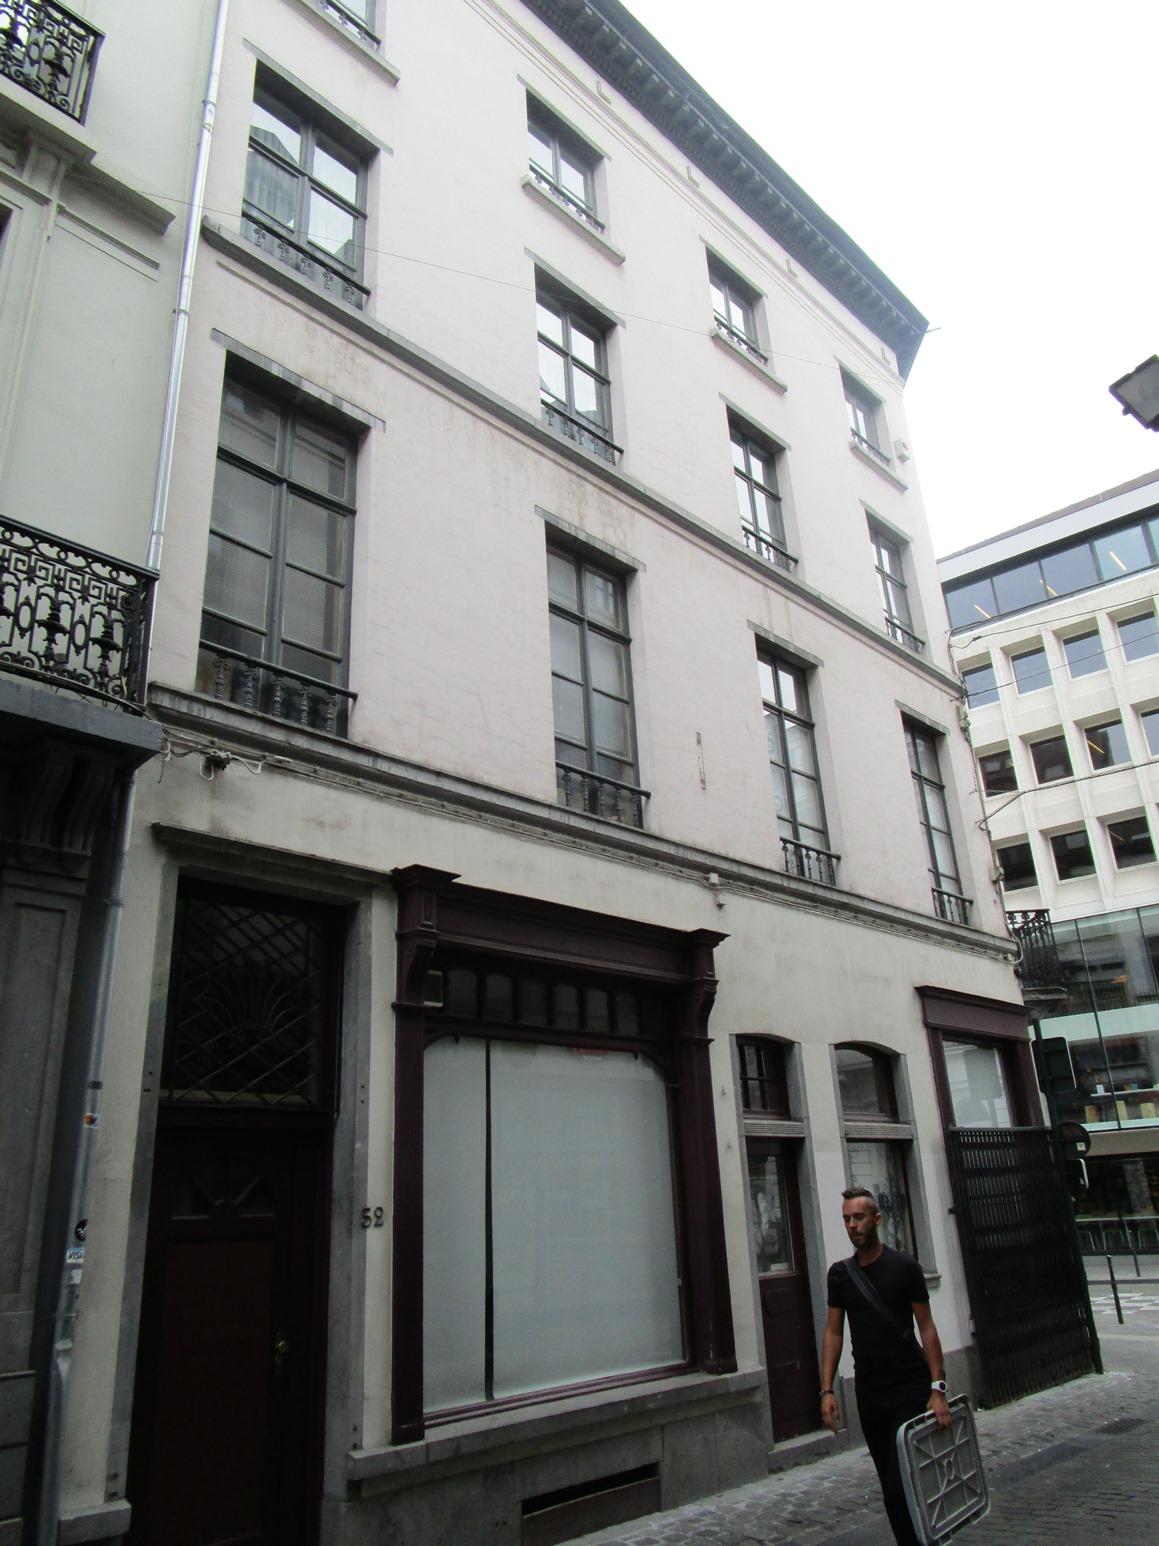 Greepstraat 54, 2015